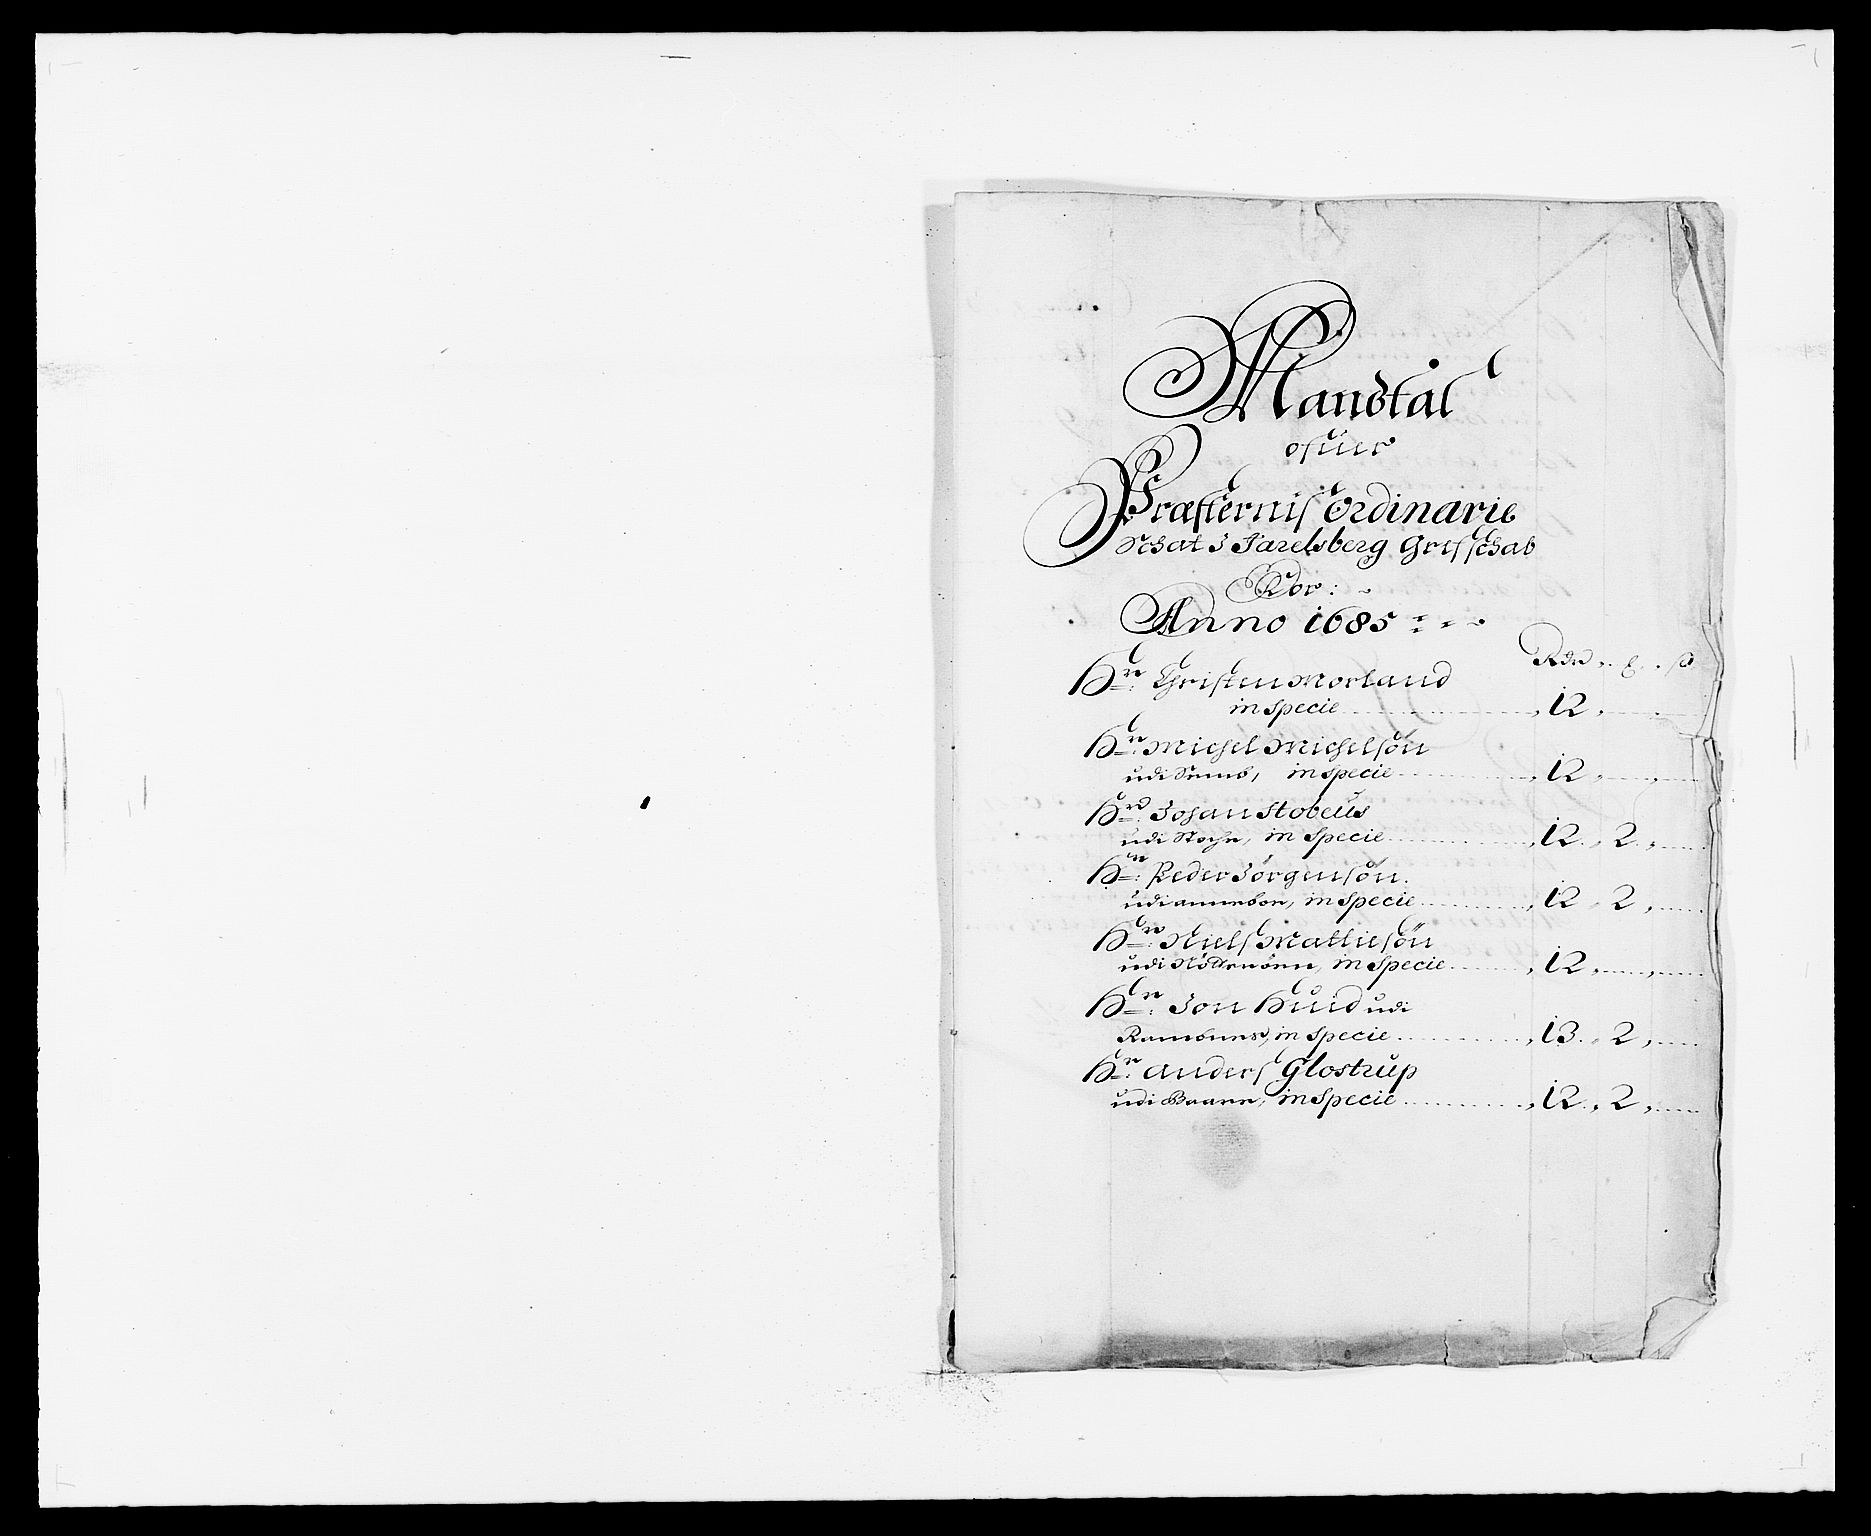 RA, Rentekammeret inntil 1814, Reviderte regnskaper, Fogderegnskap, R32/L1856: Fogderegnskap Jarlsberg grevskap, 1685, s. 355